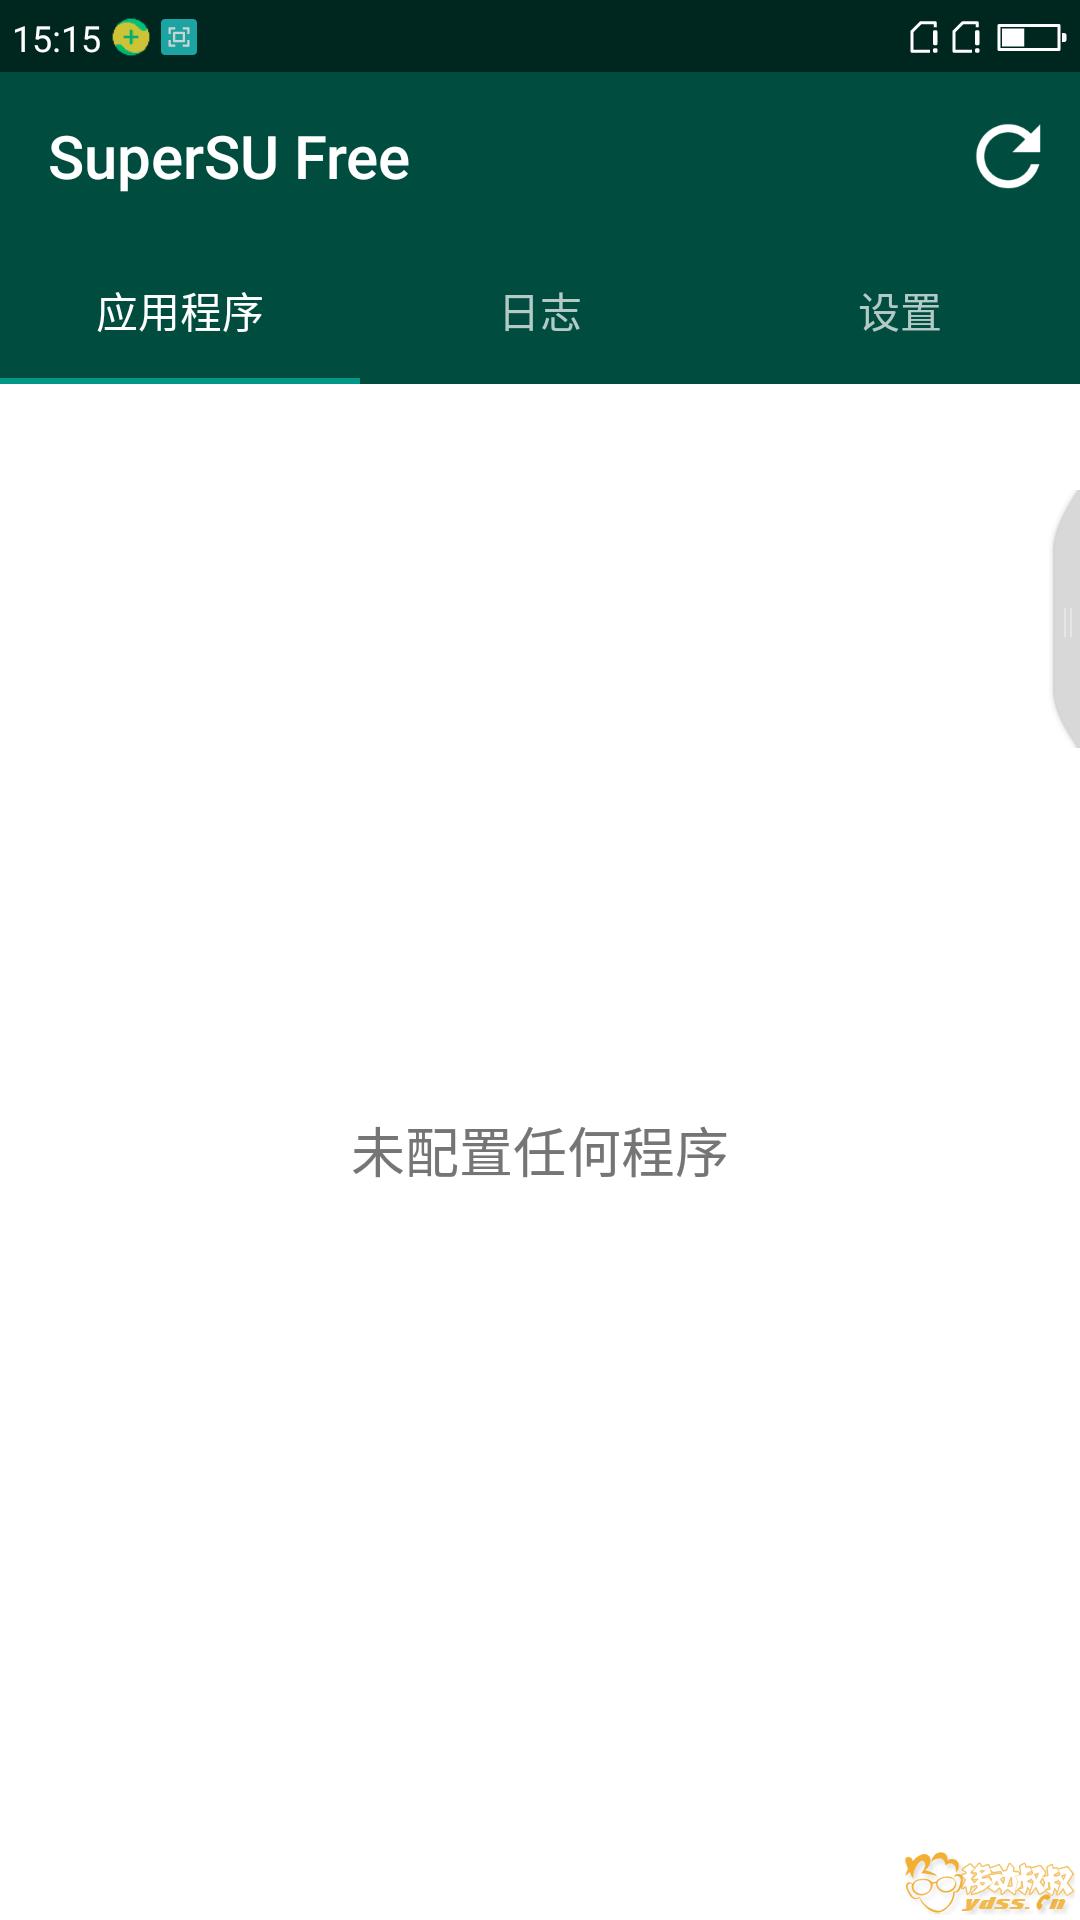 Screenshot_2017-09-08-15-16-08.png